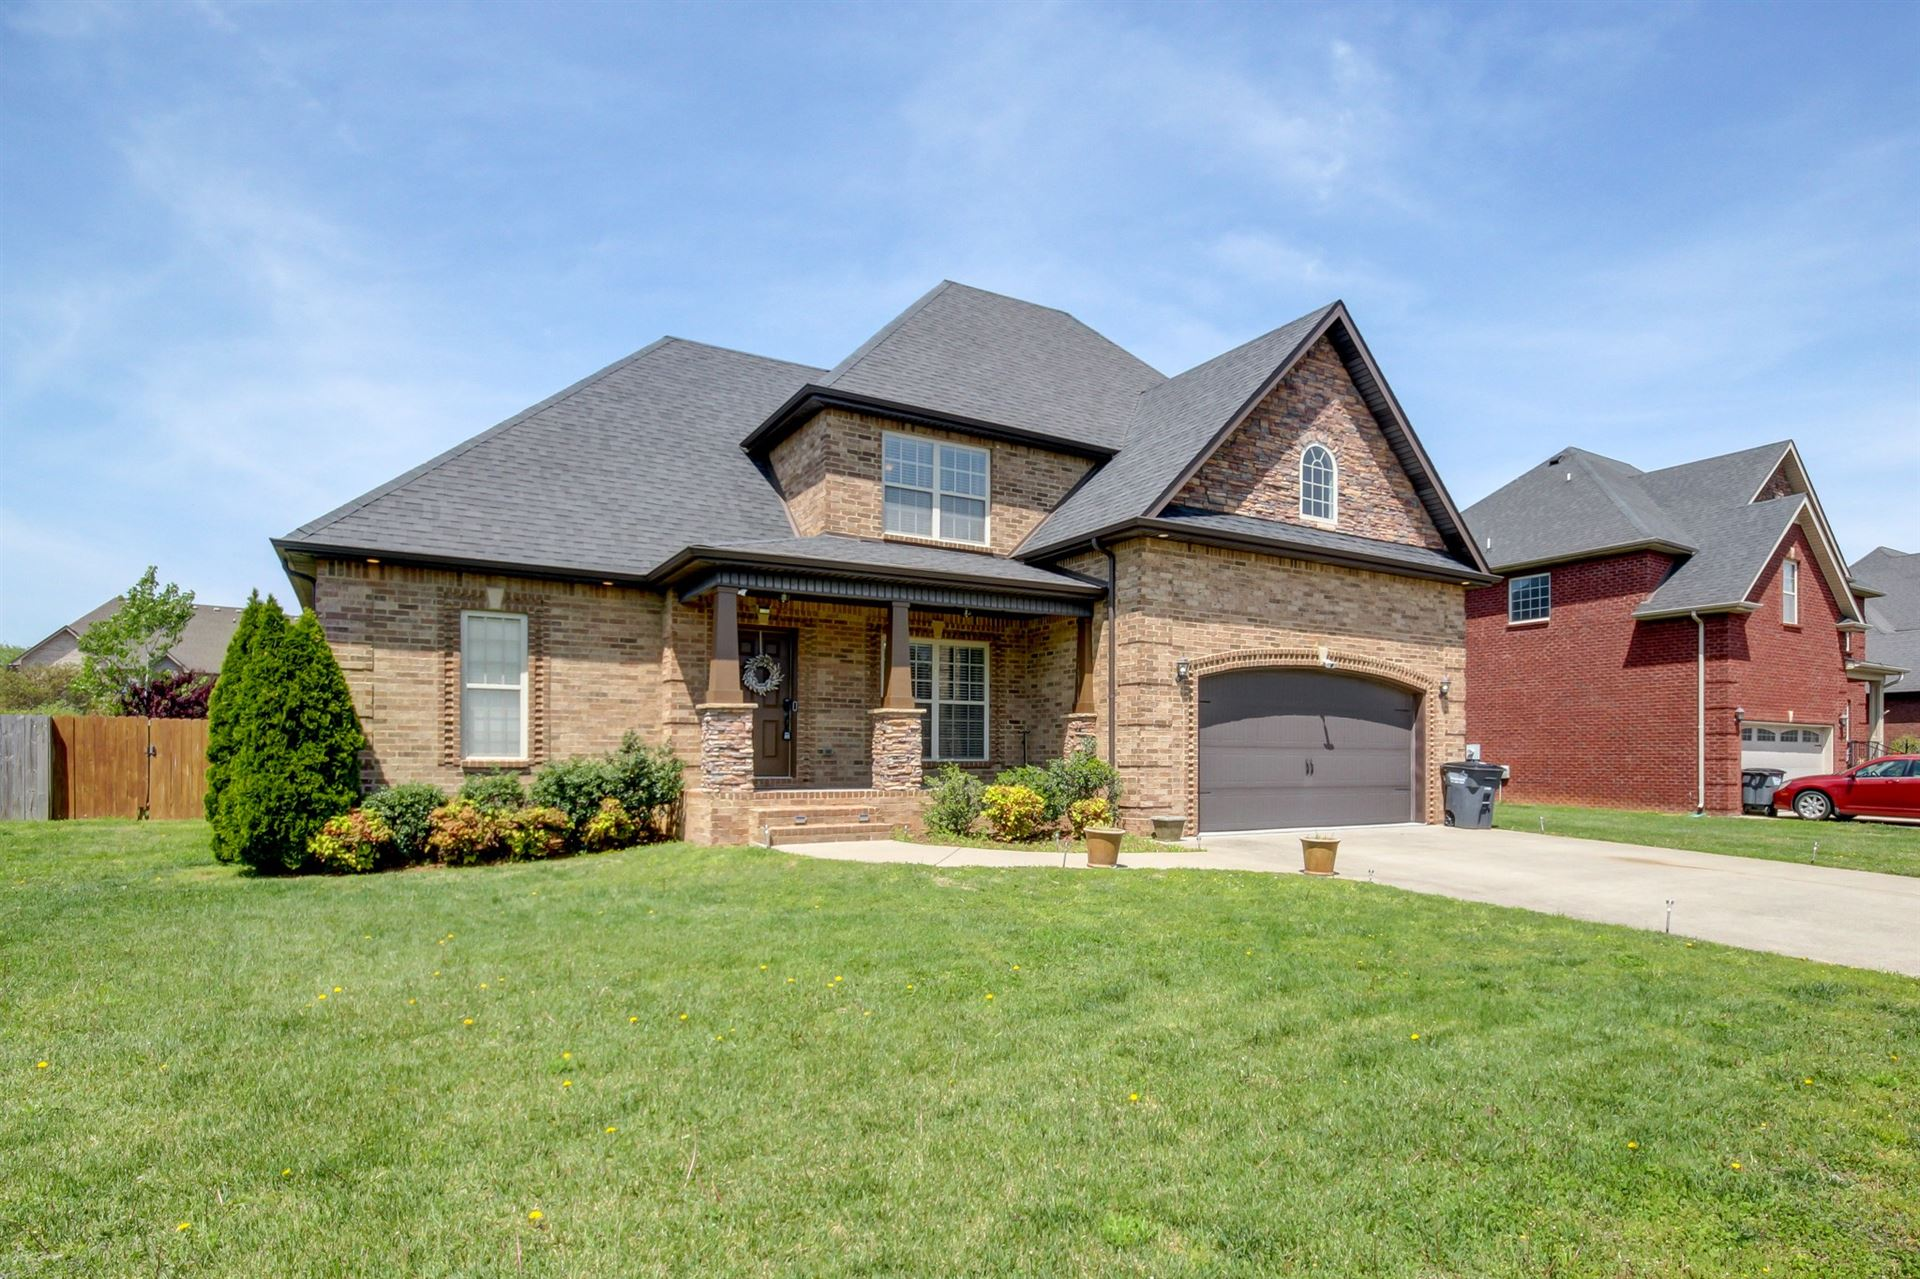 2528 Remington Trce, Clarksville, TN 37043 - MLS#: 2251133